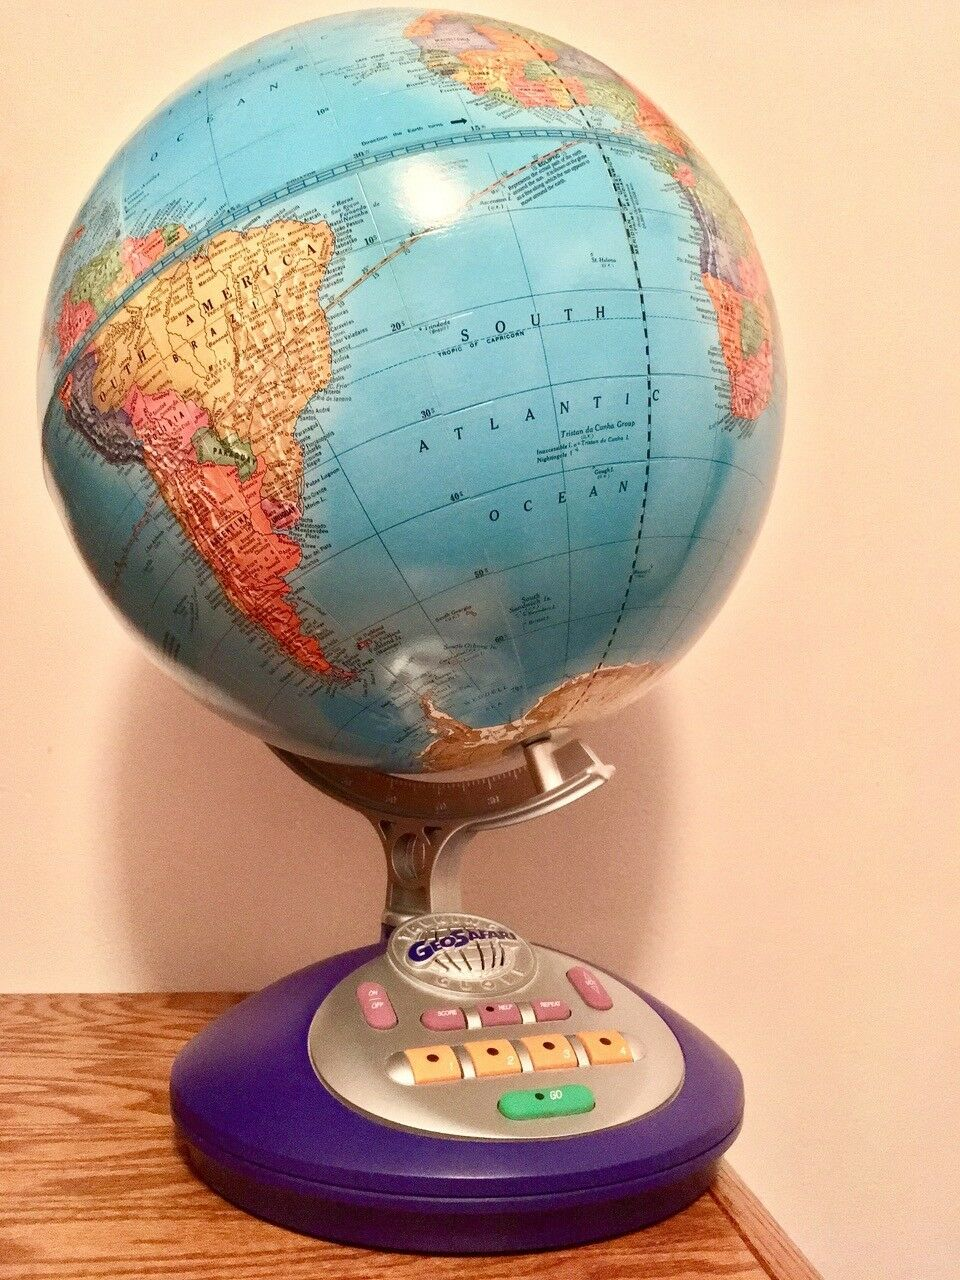 Near-New GeoSafari Talking Globe (by Educational Insights) with Original Box